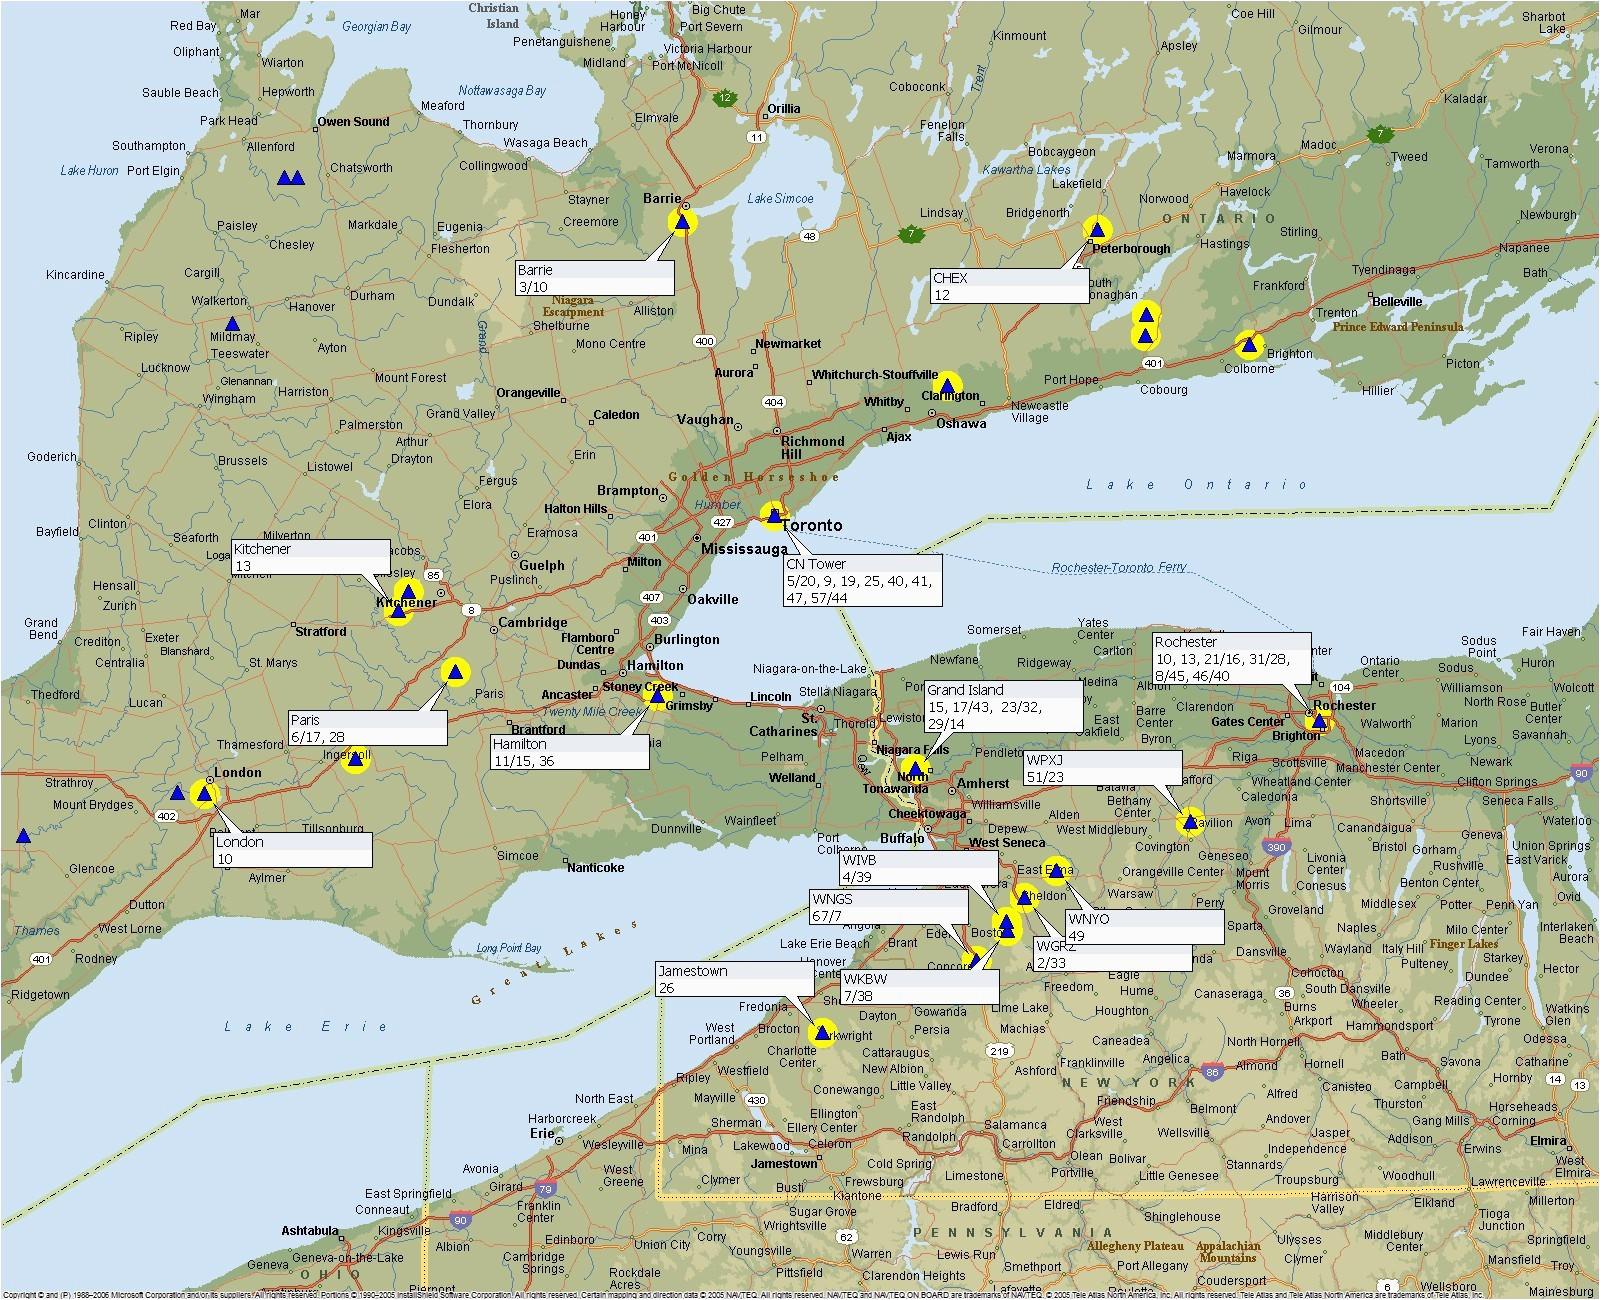 us commercial flight path map helloflight luxury us election map